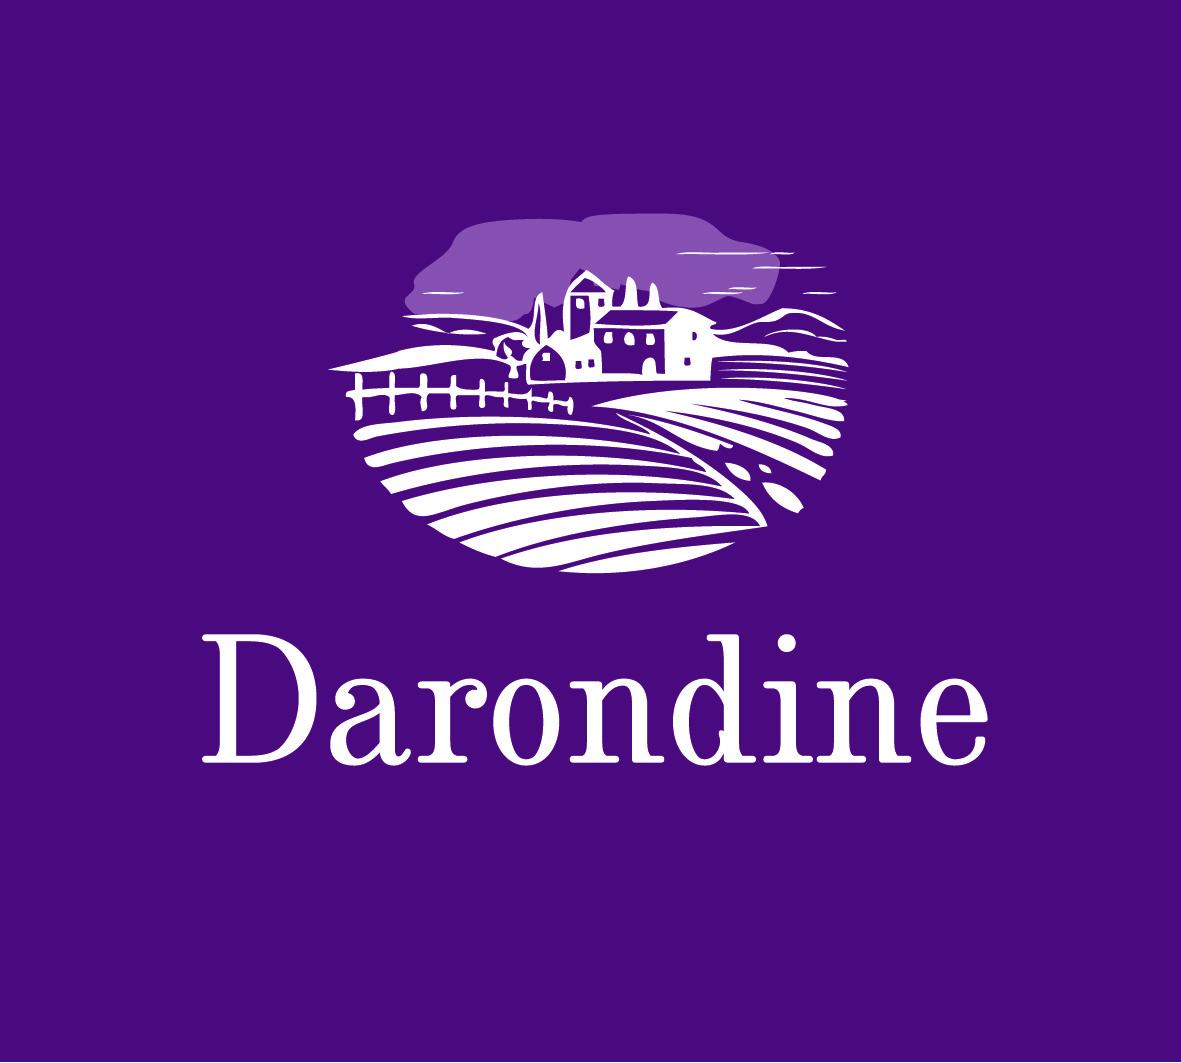 logo_darondine_p7652_hdef